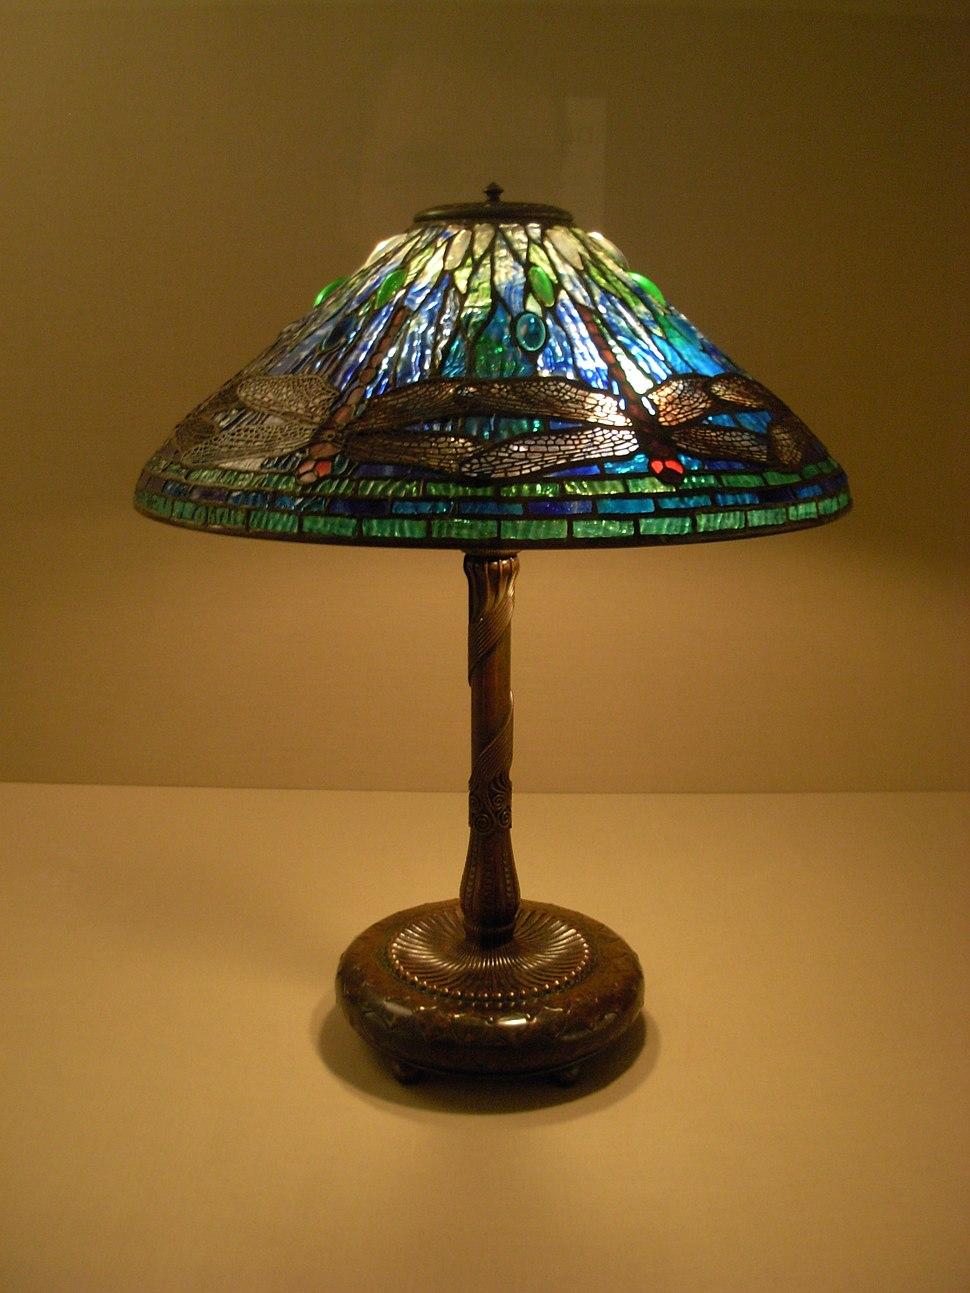 Carnegie Museum of Art - Tiffany's lamp